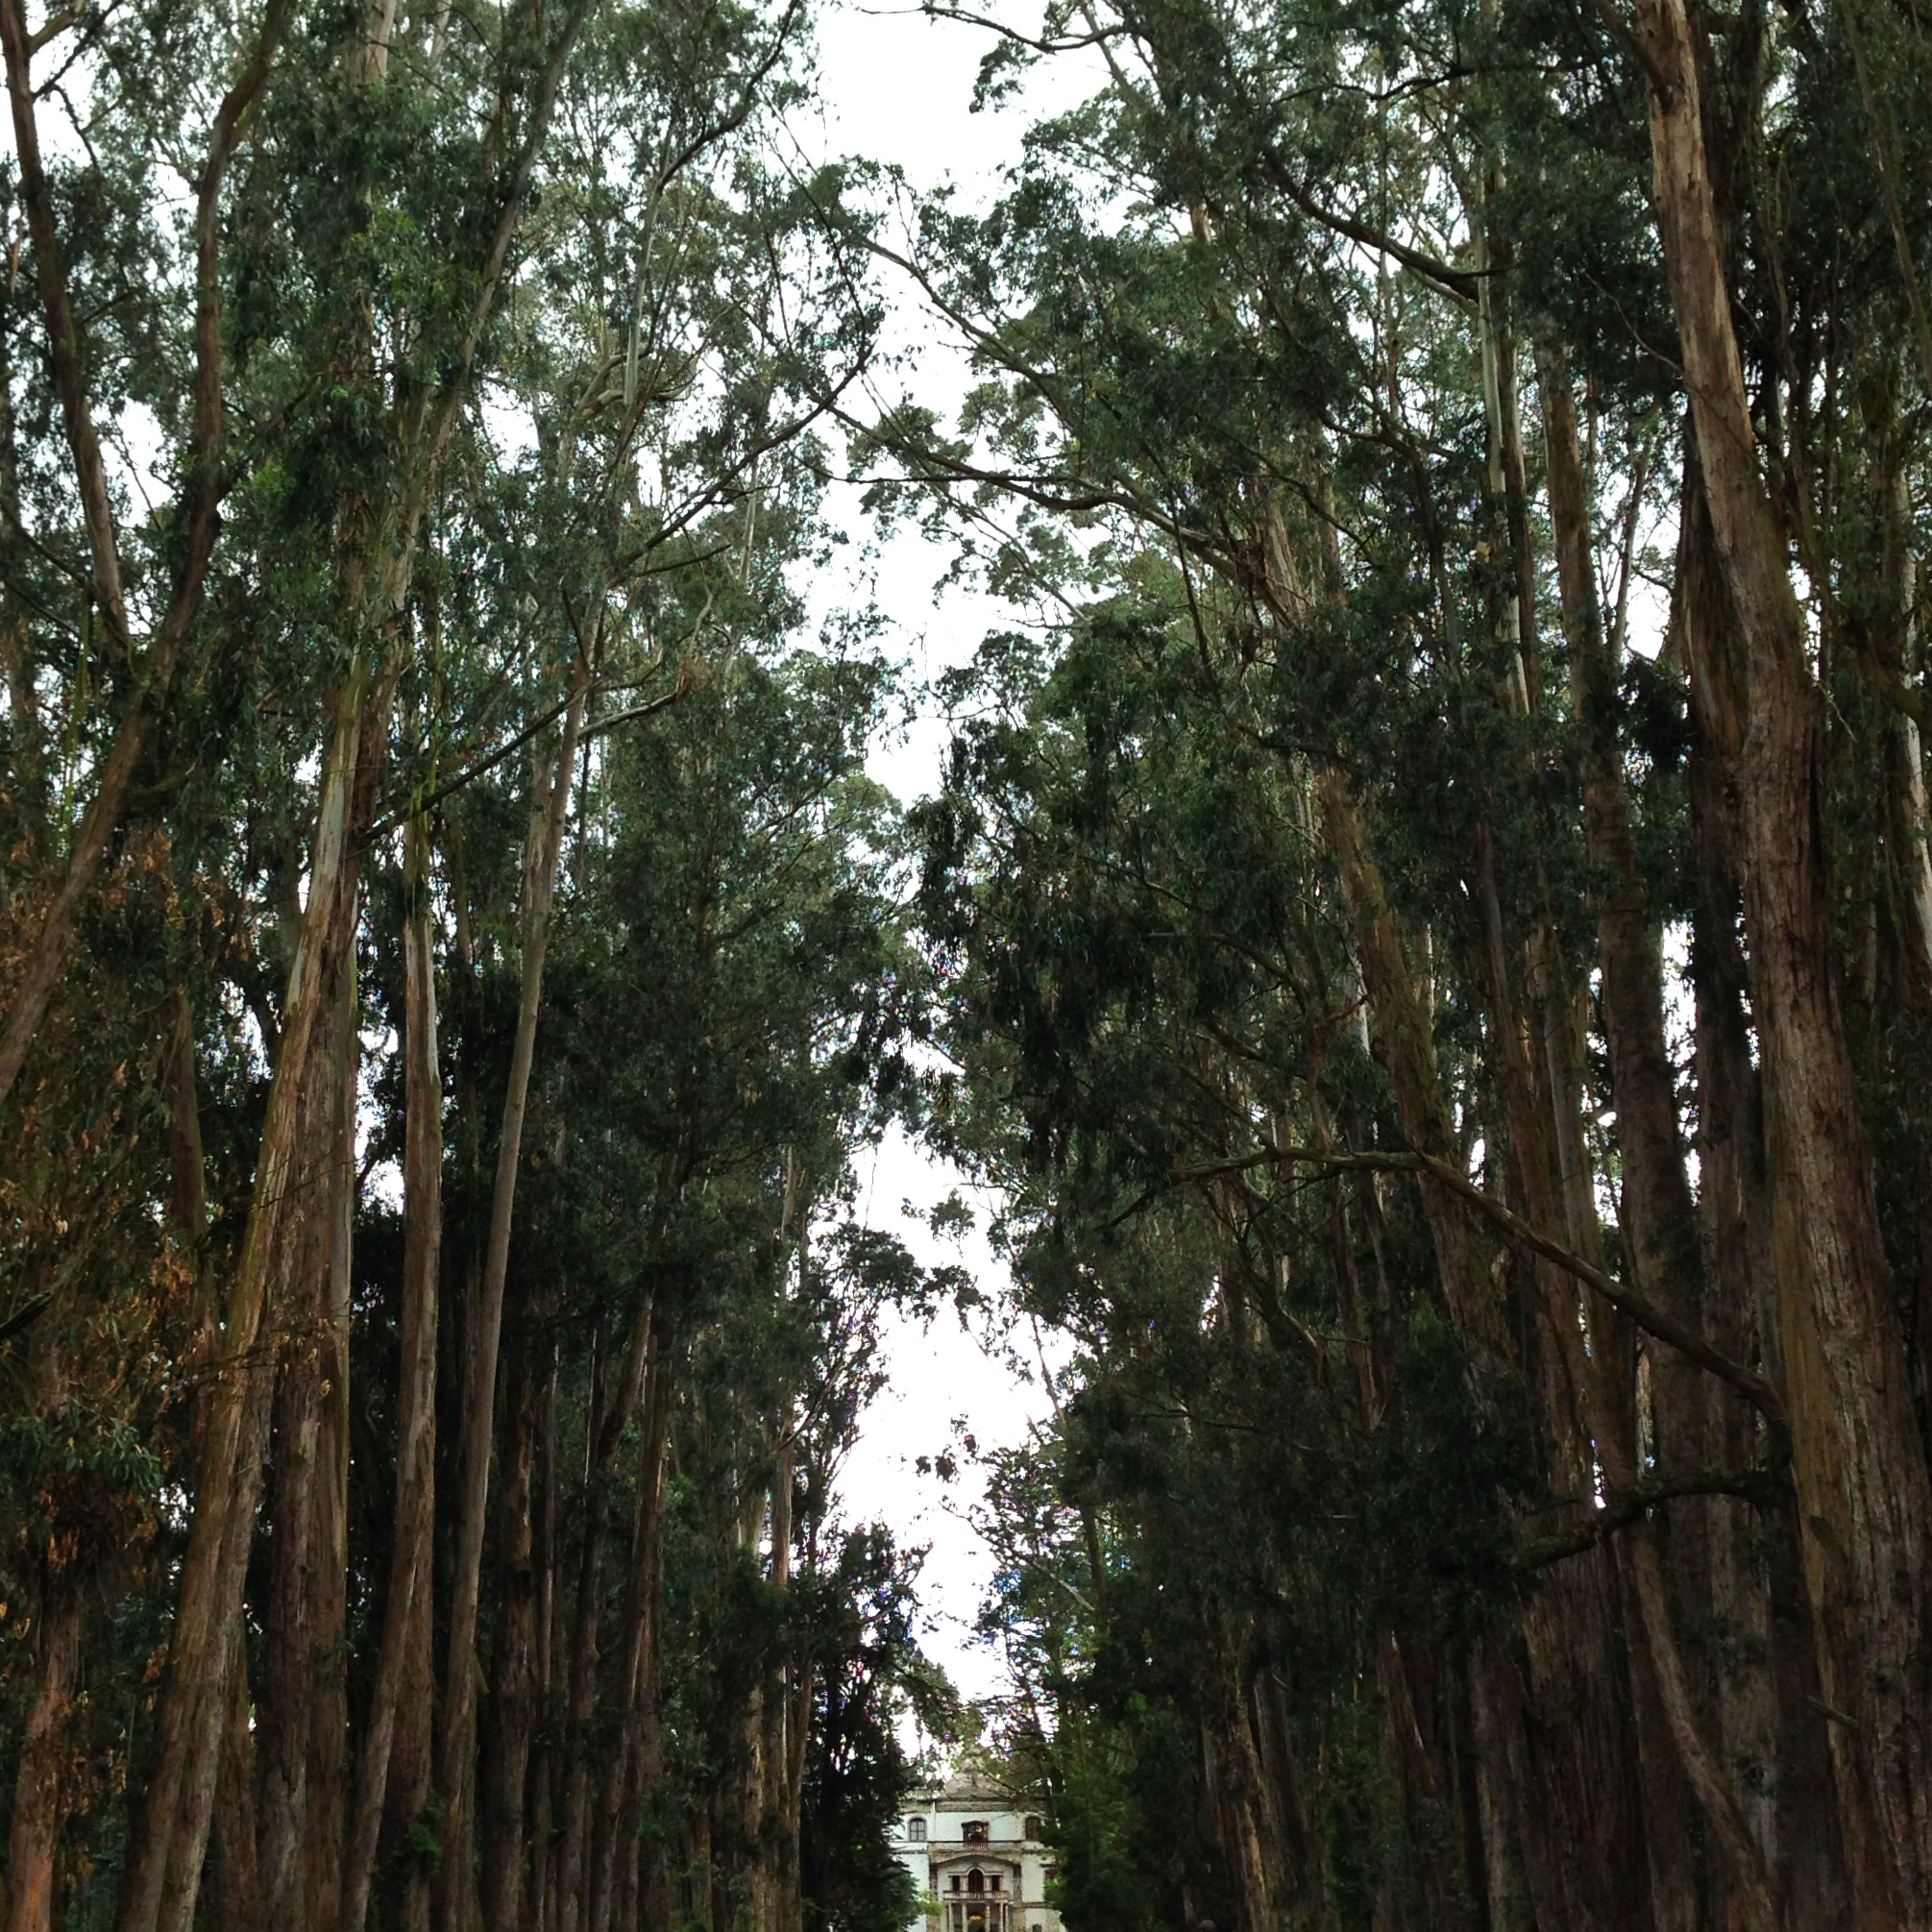 Gorgeous eucalyptus trees lining the entrance